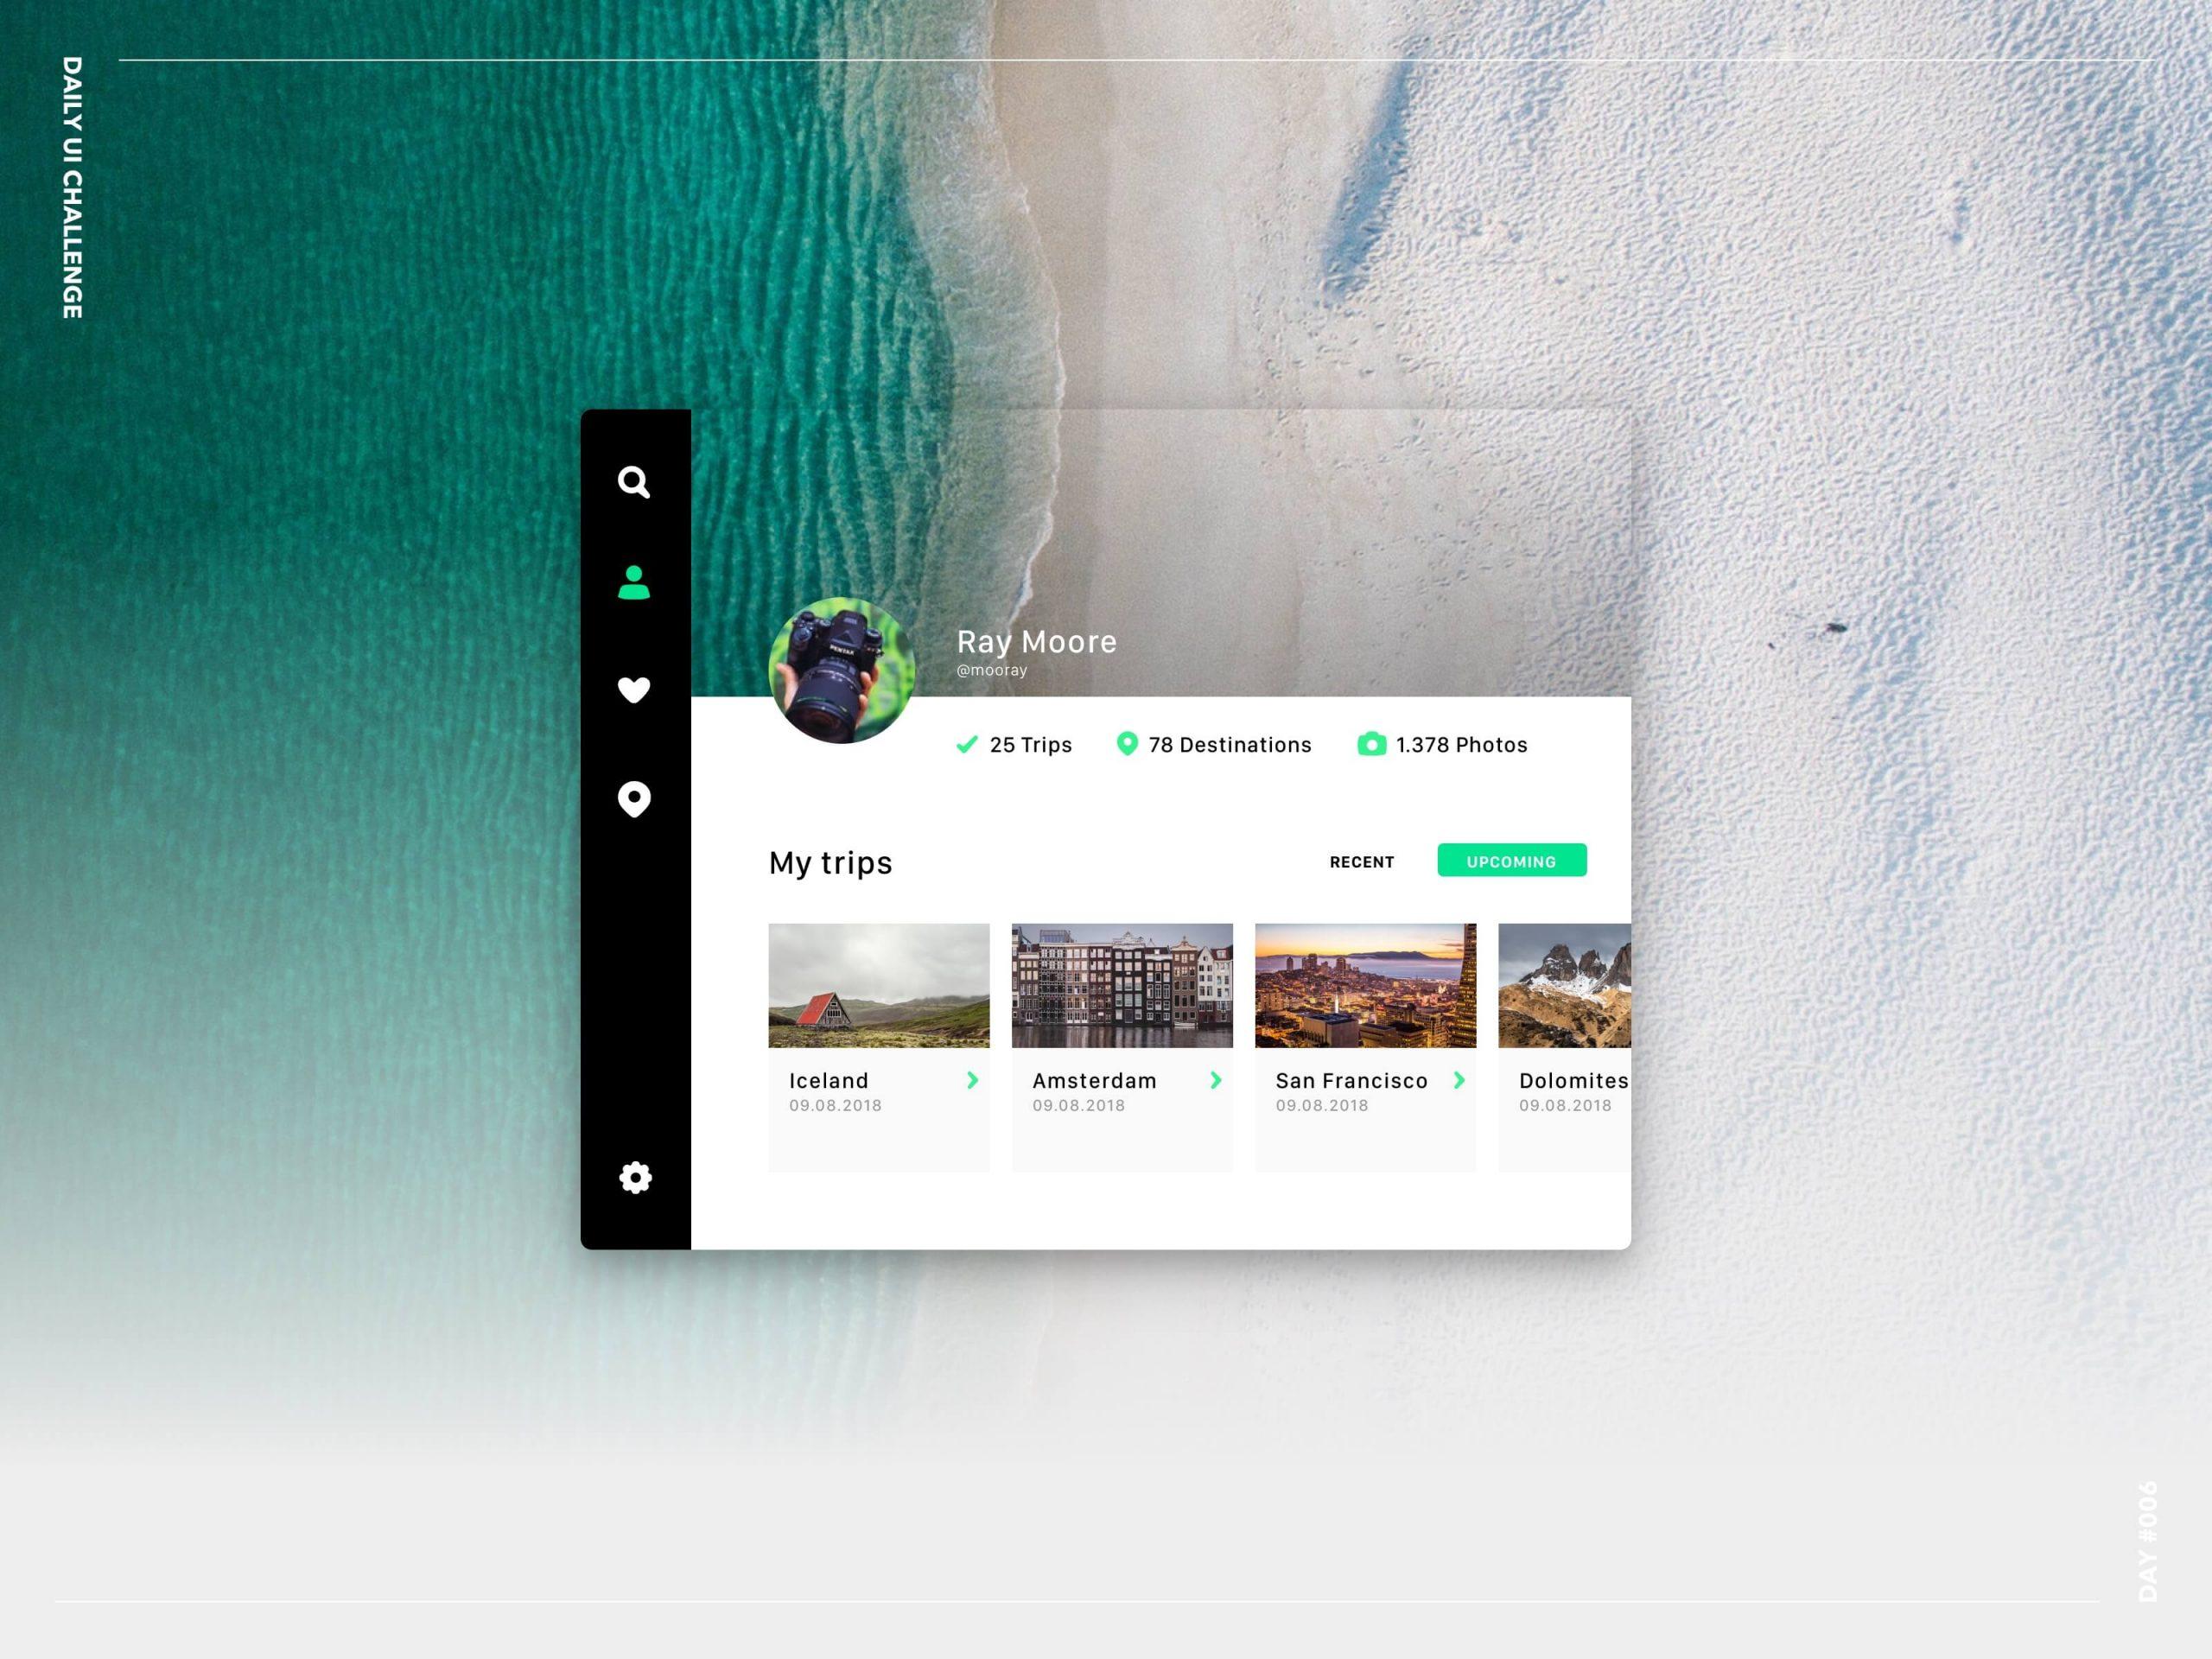 006-DUIC-User-Profile-Dribbble-1